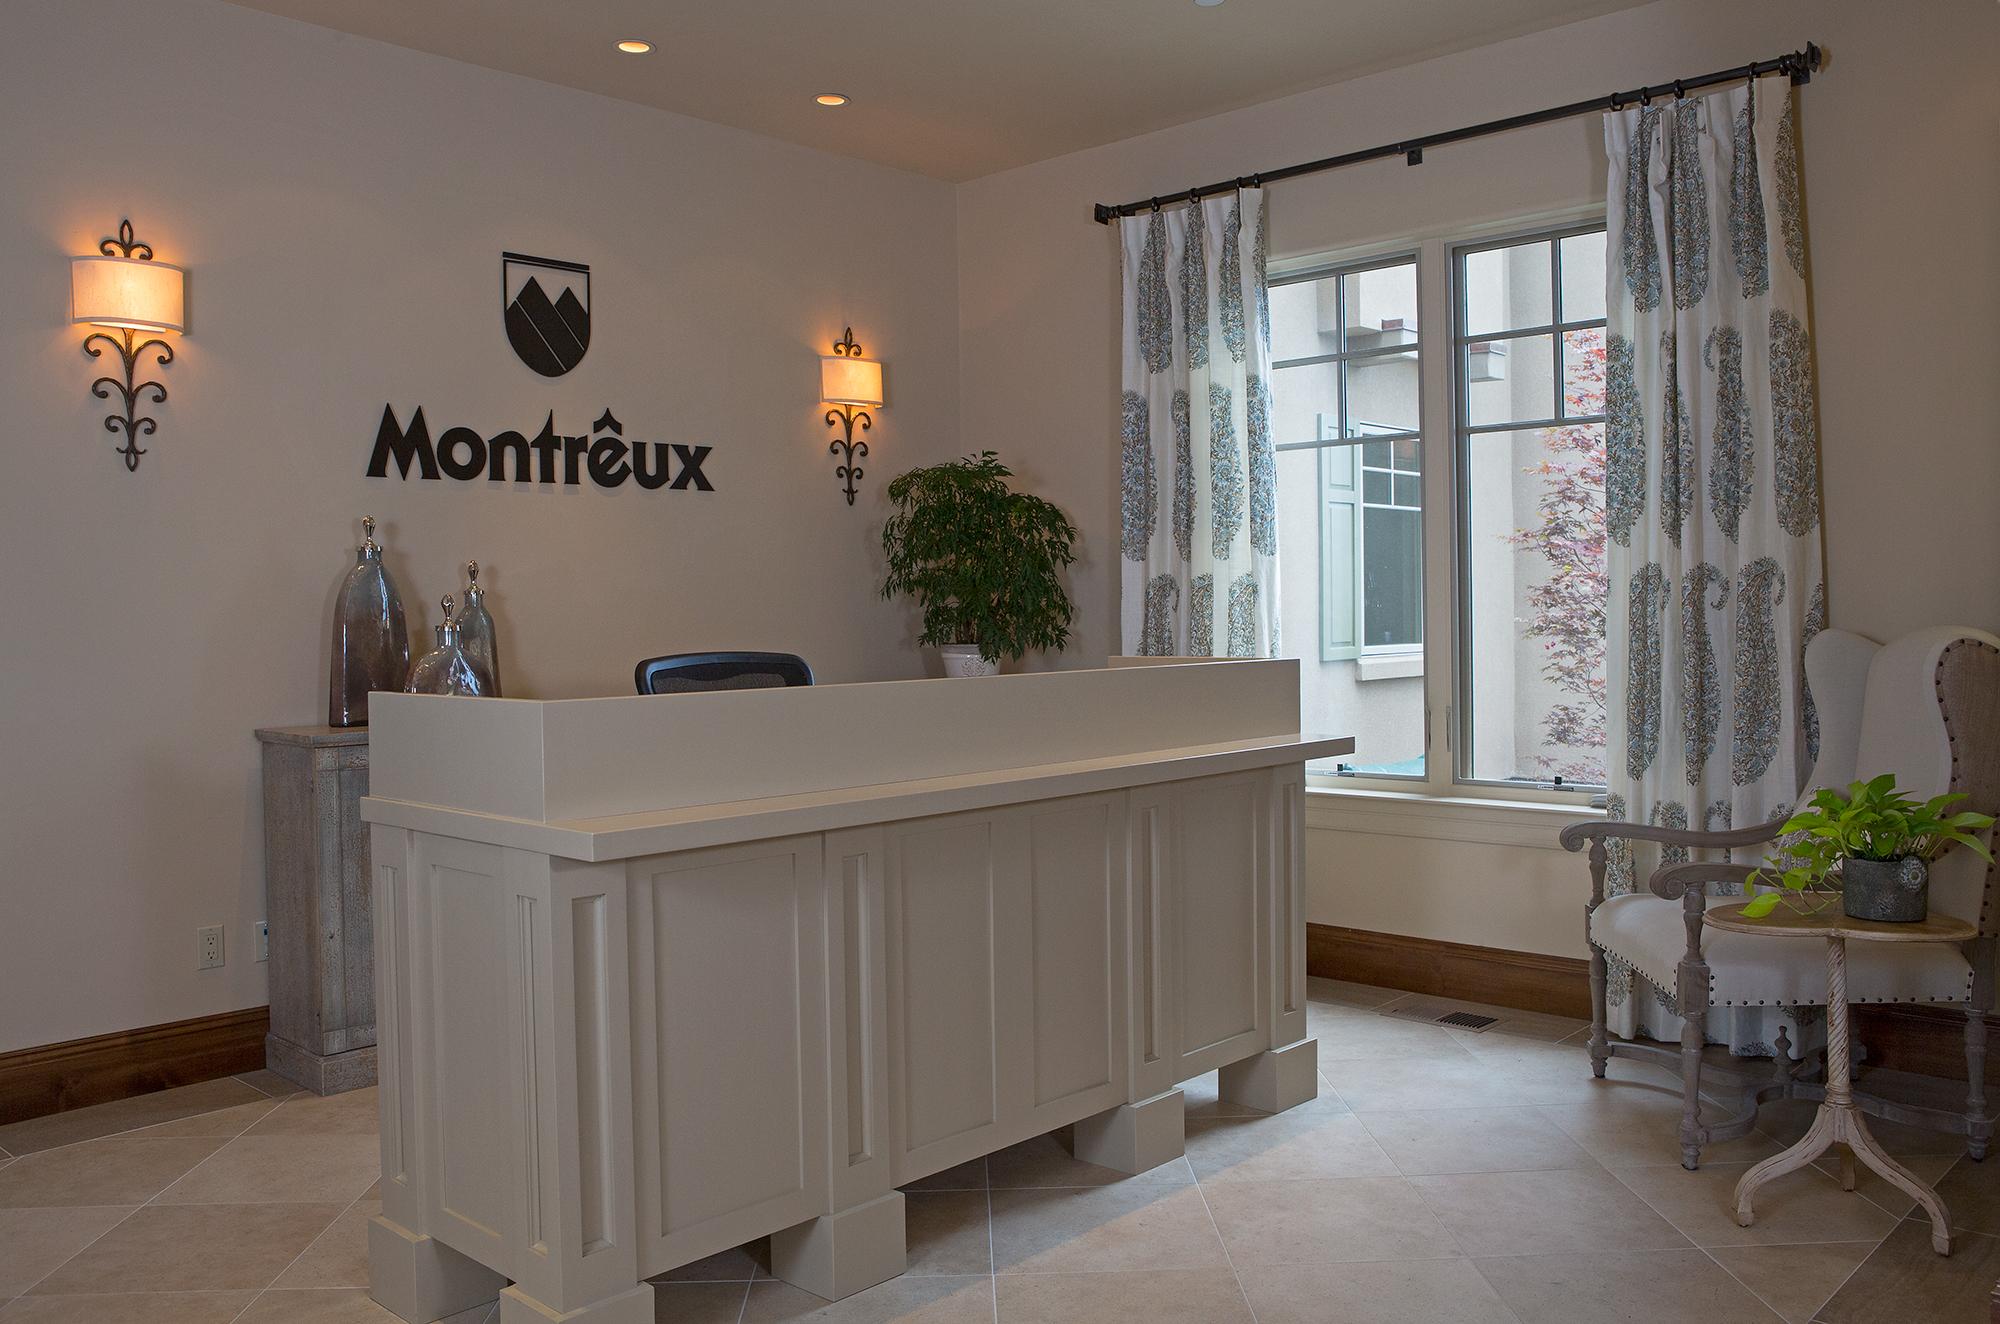 Montreux-40.jpg